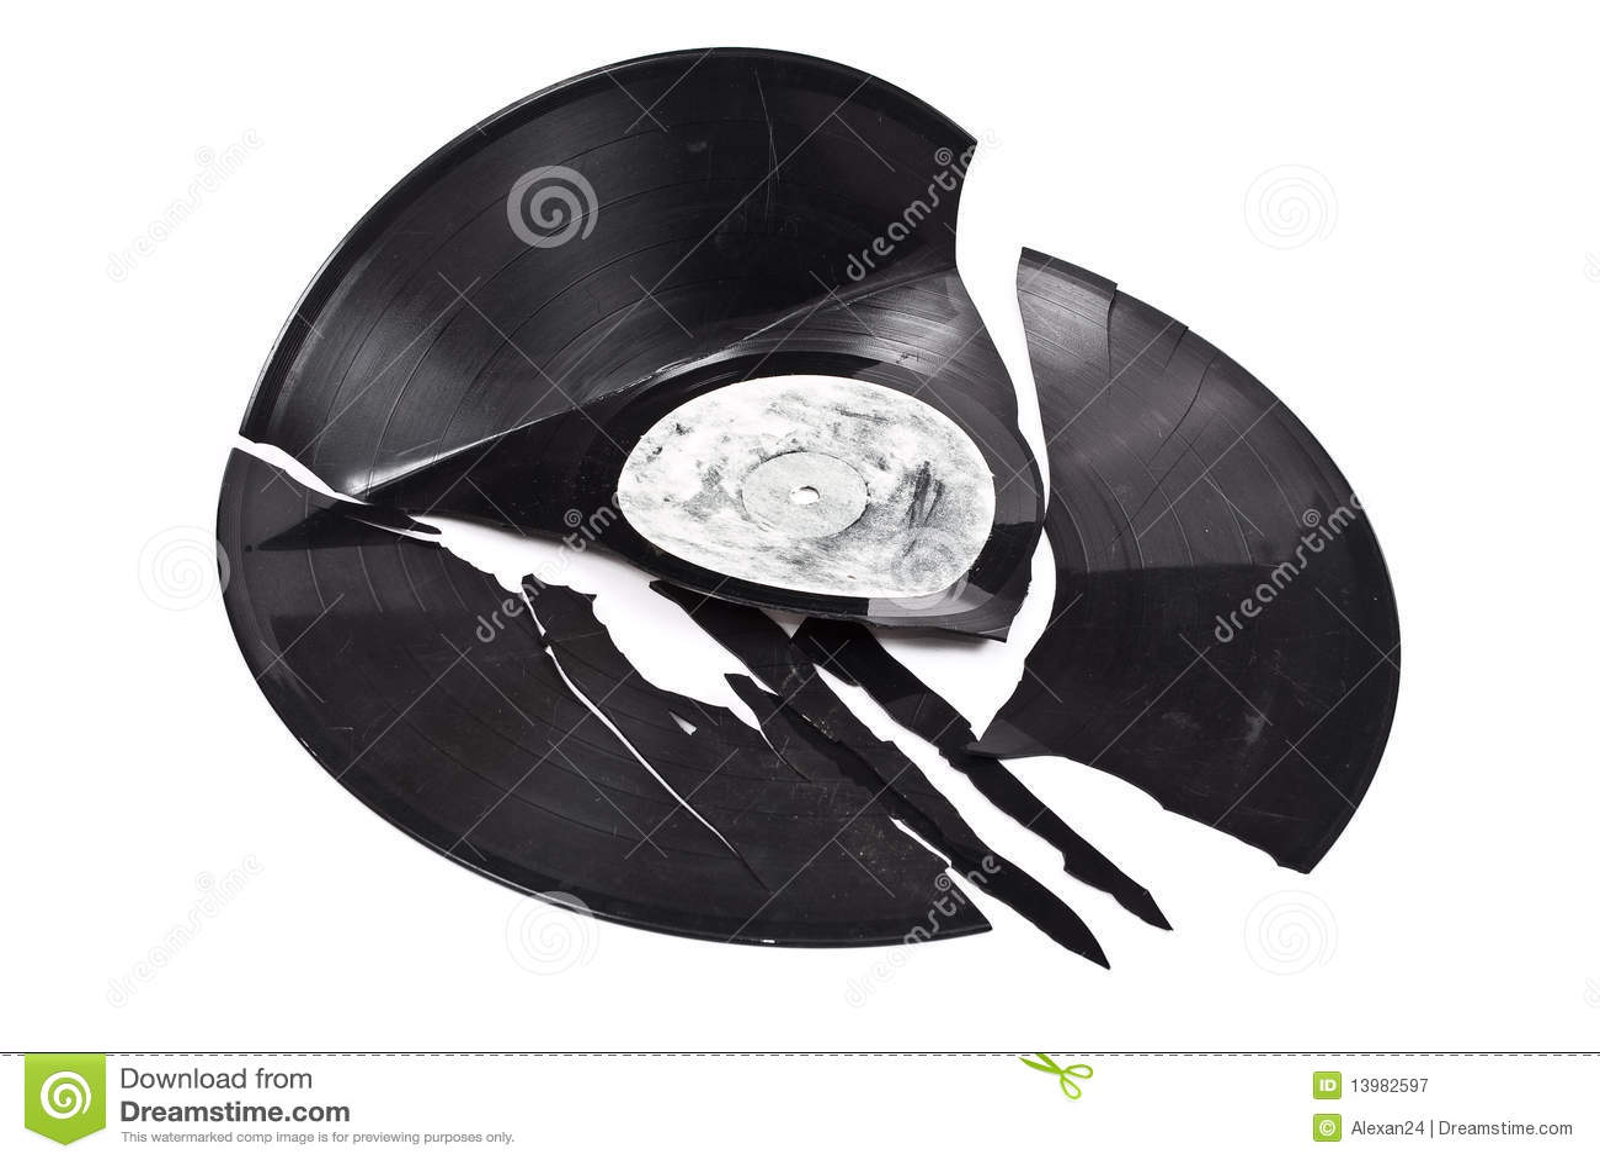 Broken Vinyl Record Royalty Free Stock Image